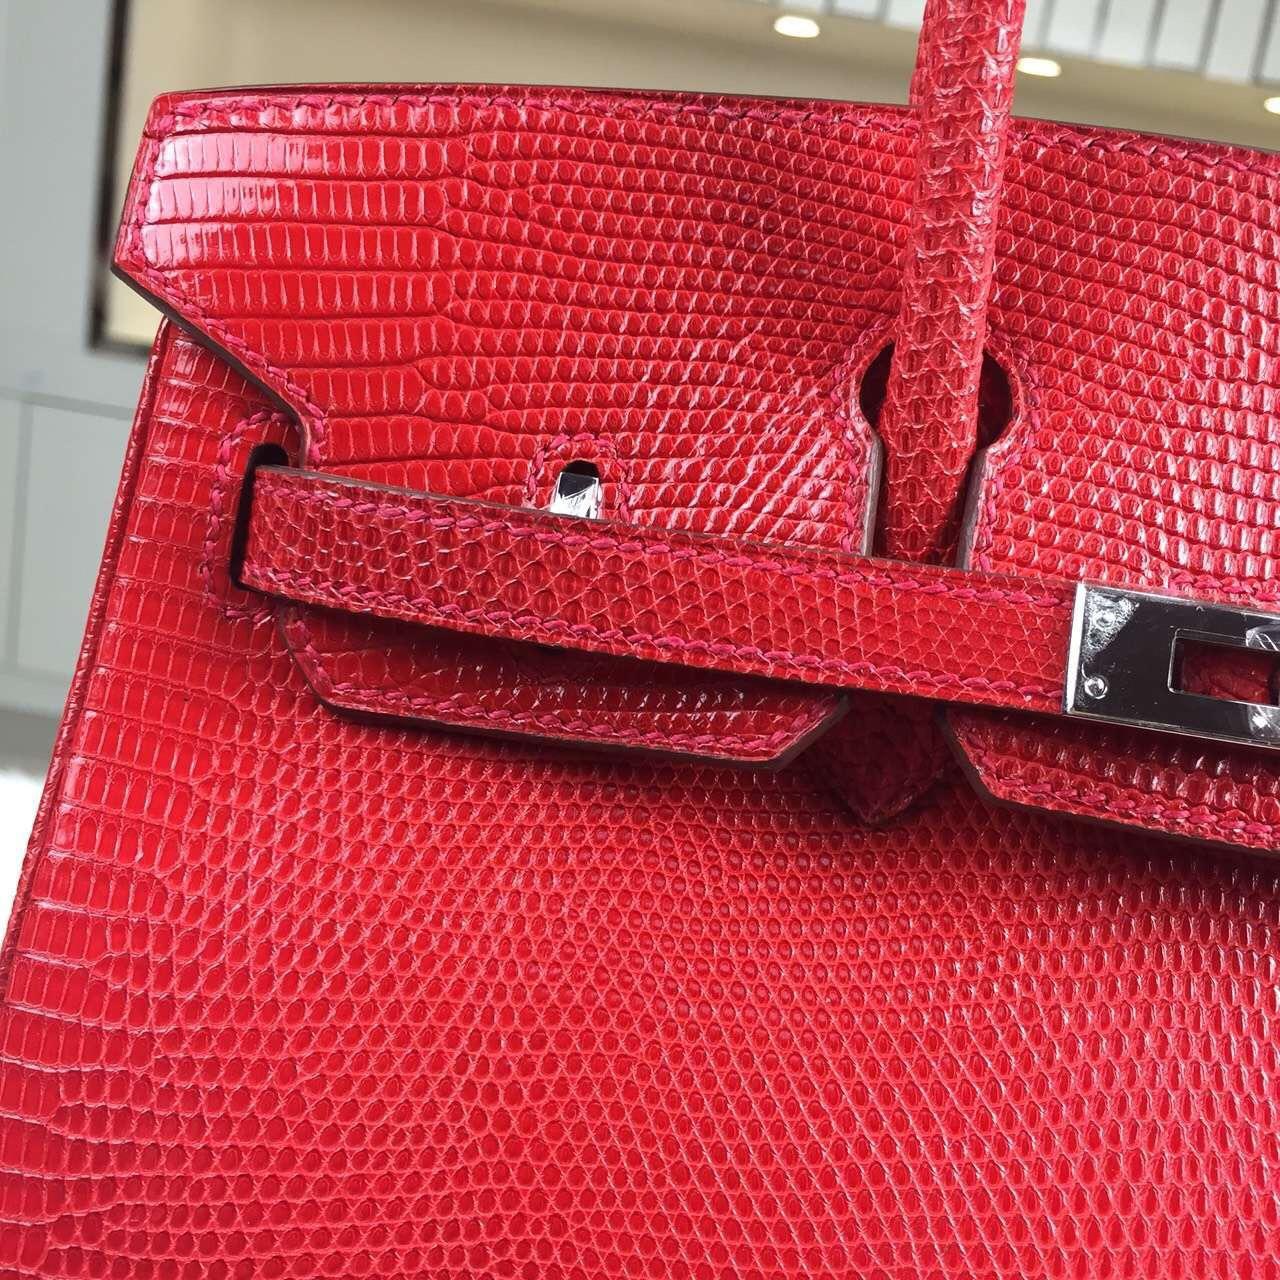 Hand Stitching Hermes Birkin Bag25cm Red HCP Lizard Skin Leather Women's Tote Bag